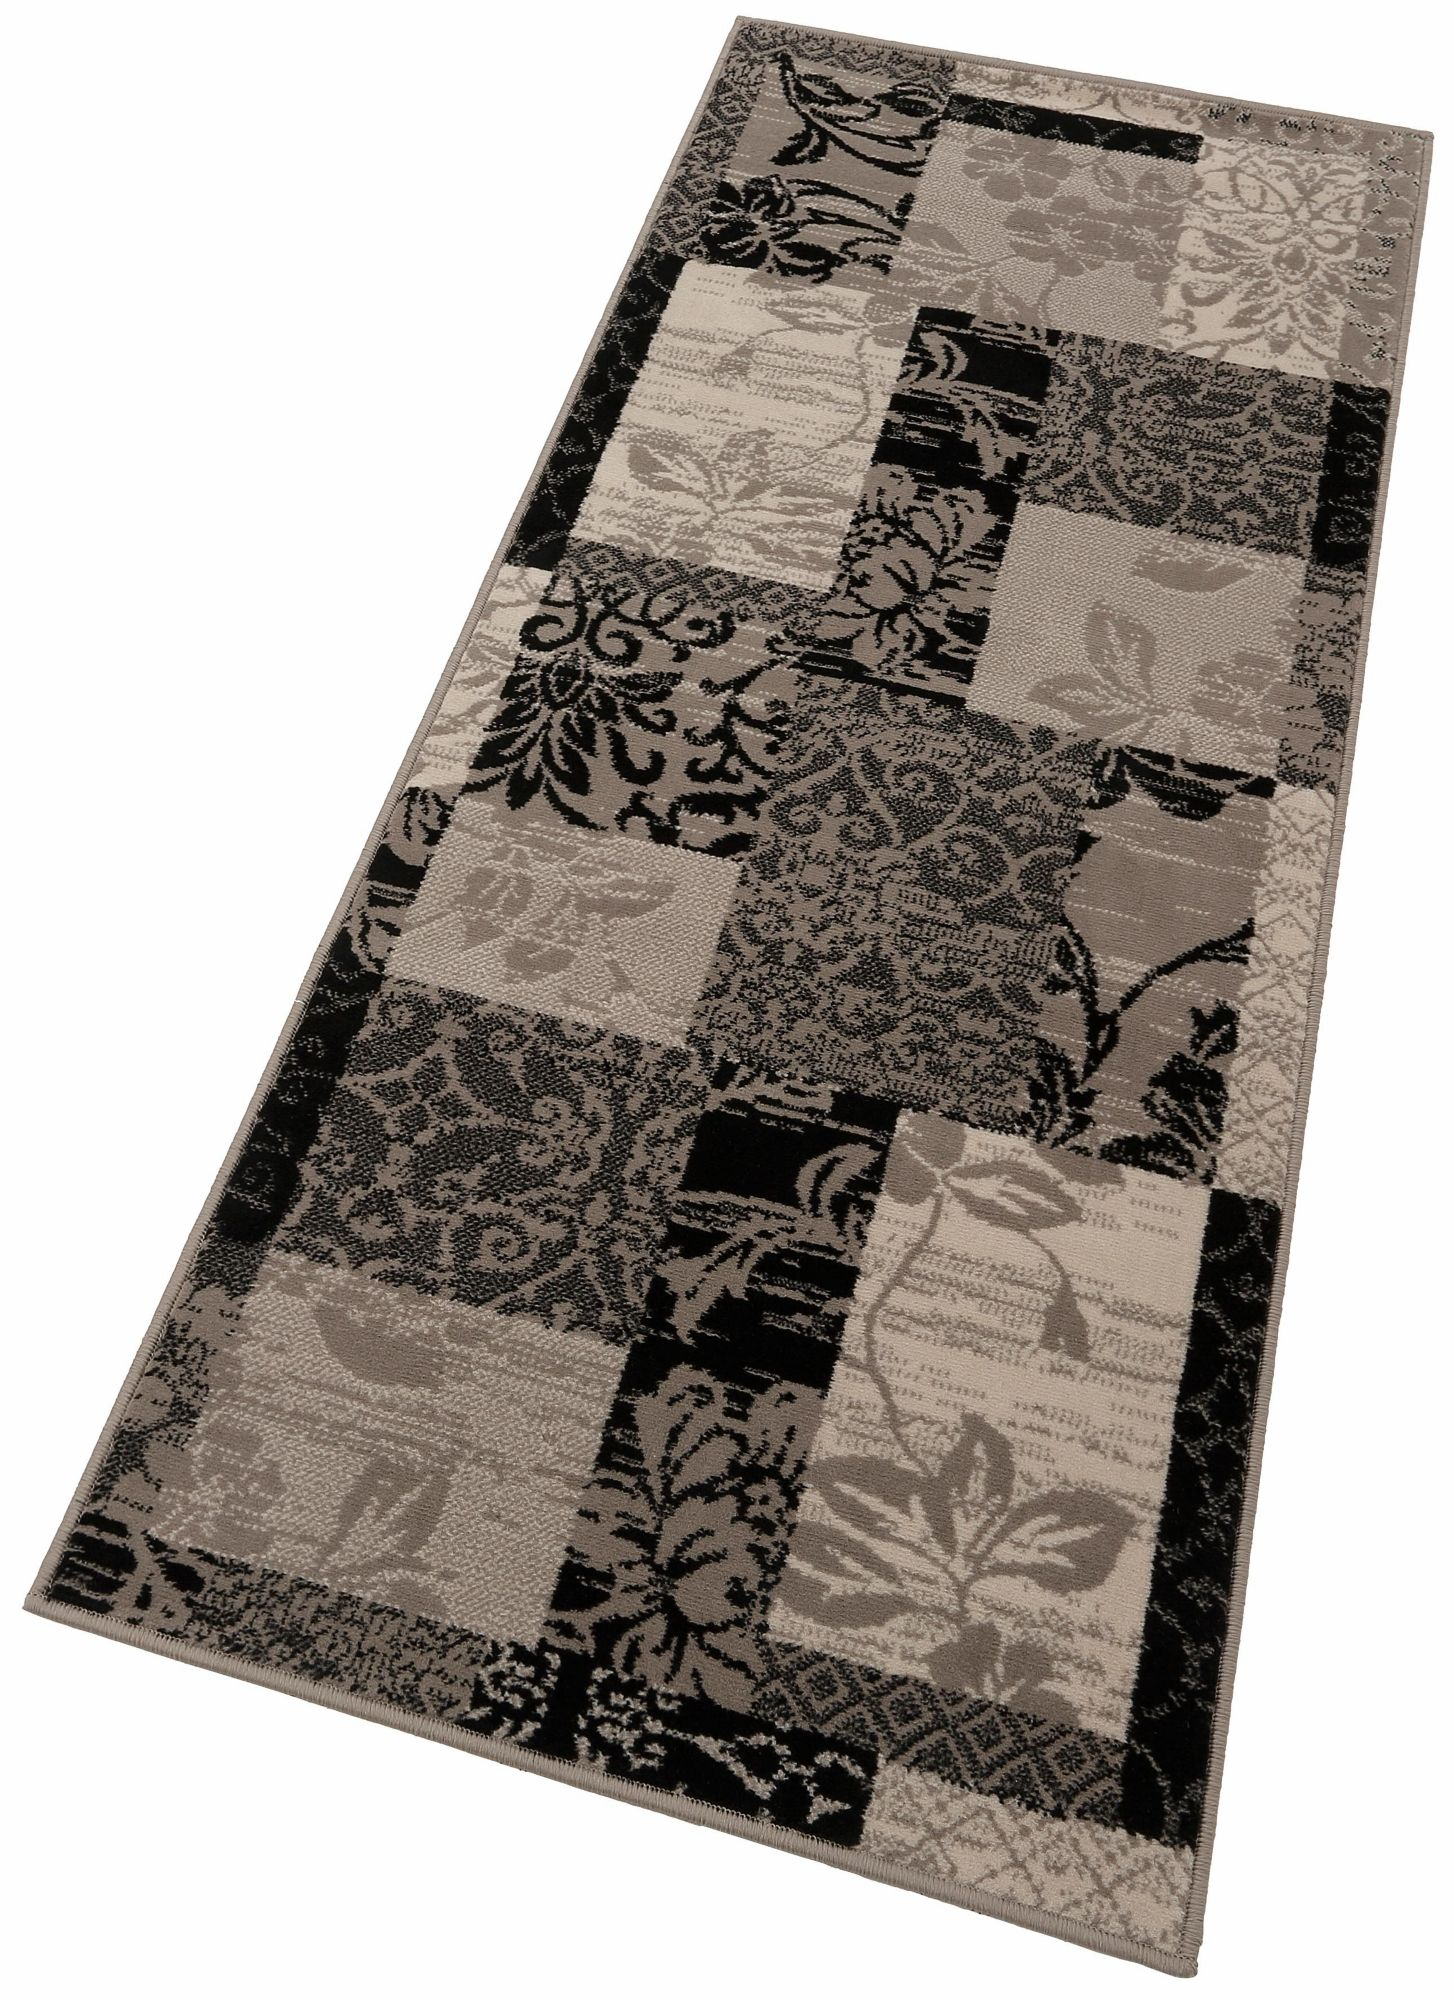 l ufer hanse home paliseu patchwork optik floral gemustert maschinengewebt schwab. Black Bedroom Furniture Sets. Home Design Ideas